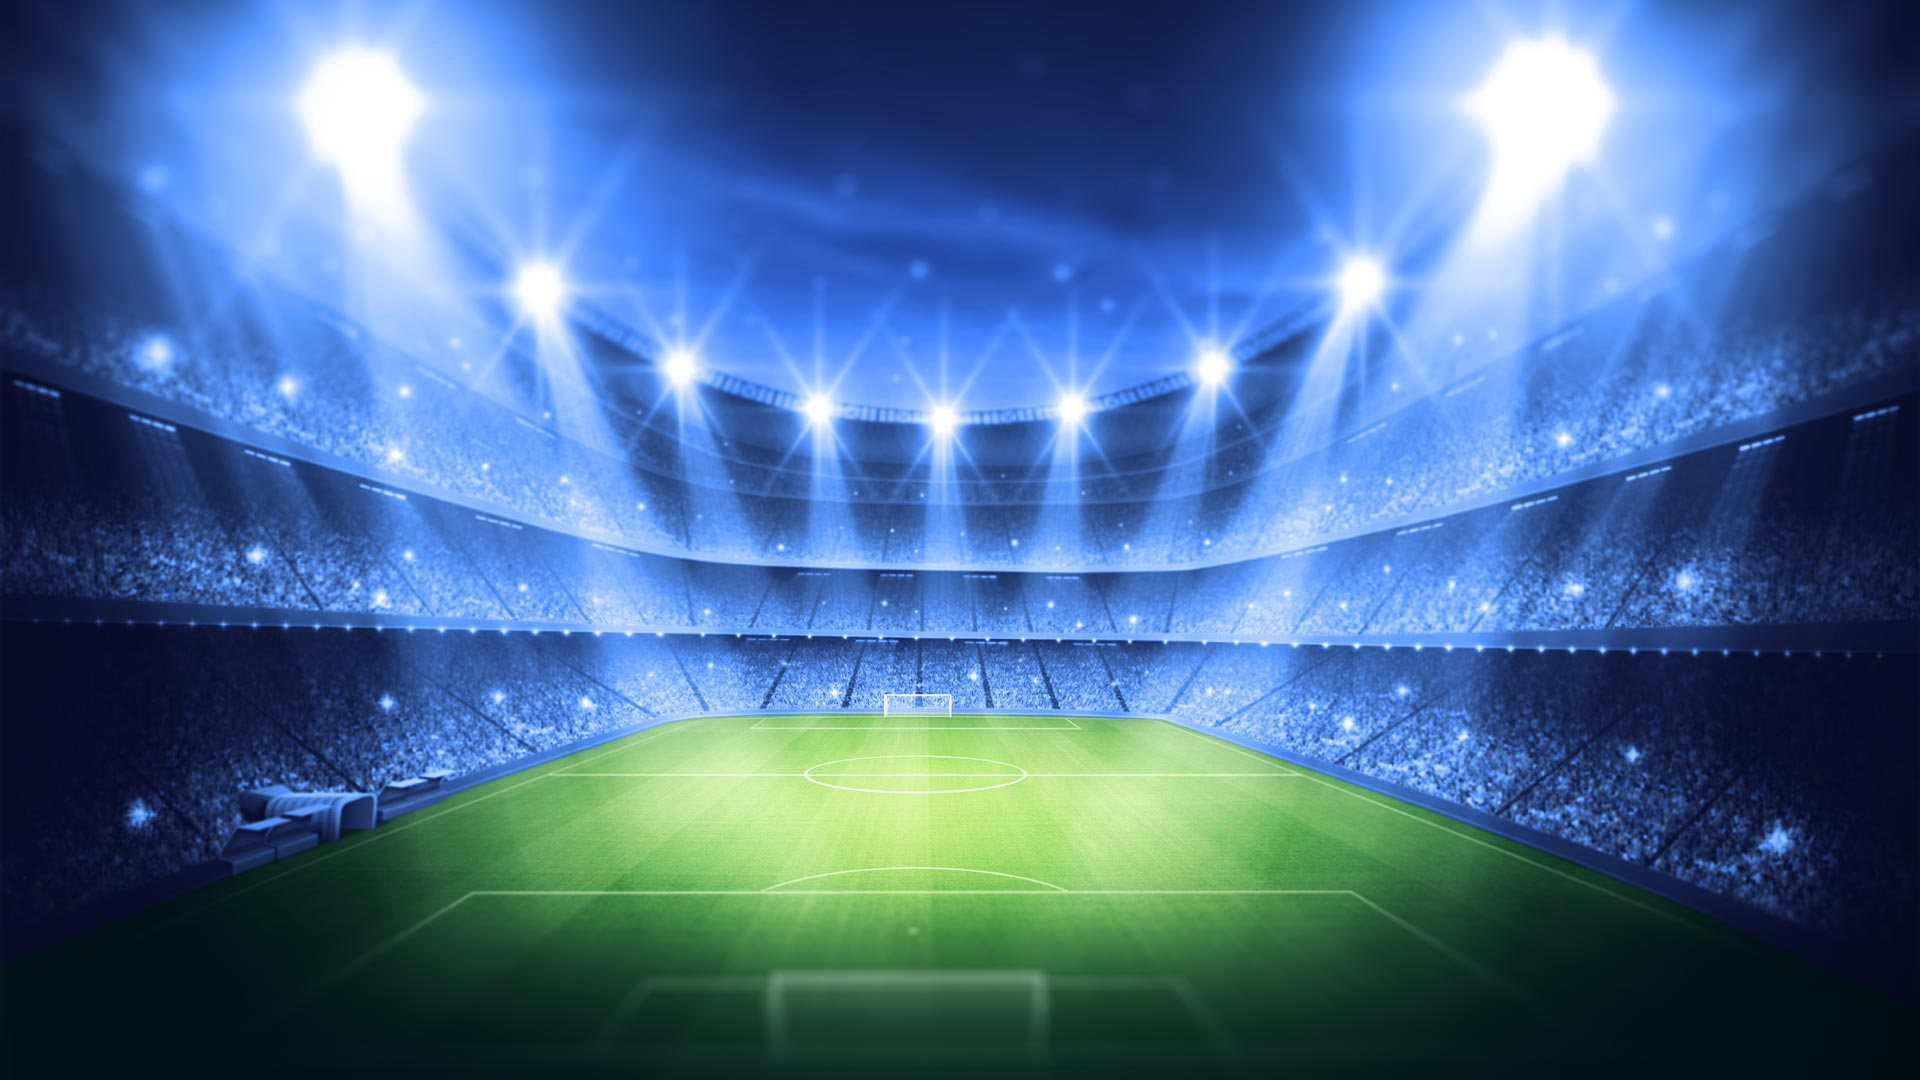 Champions League Preview PSG vs Man City Wolfsburg vs 1920x768